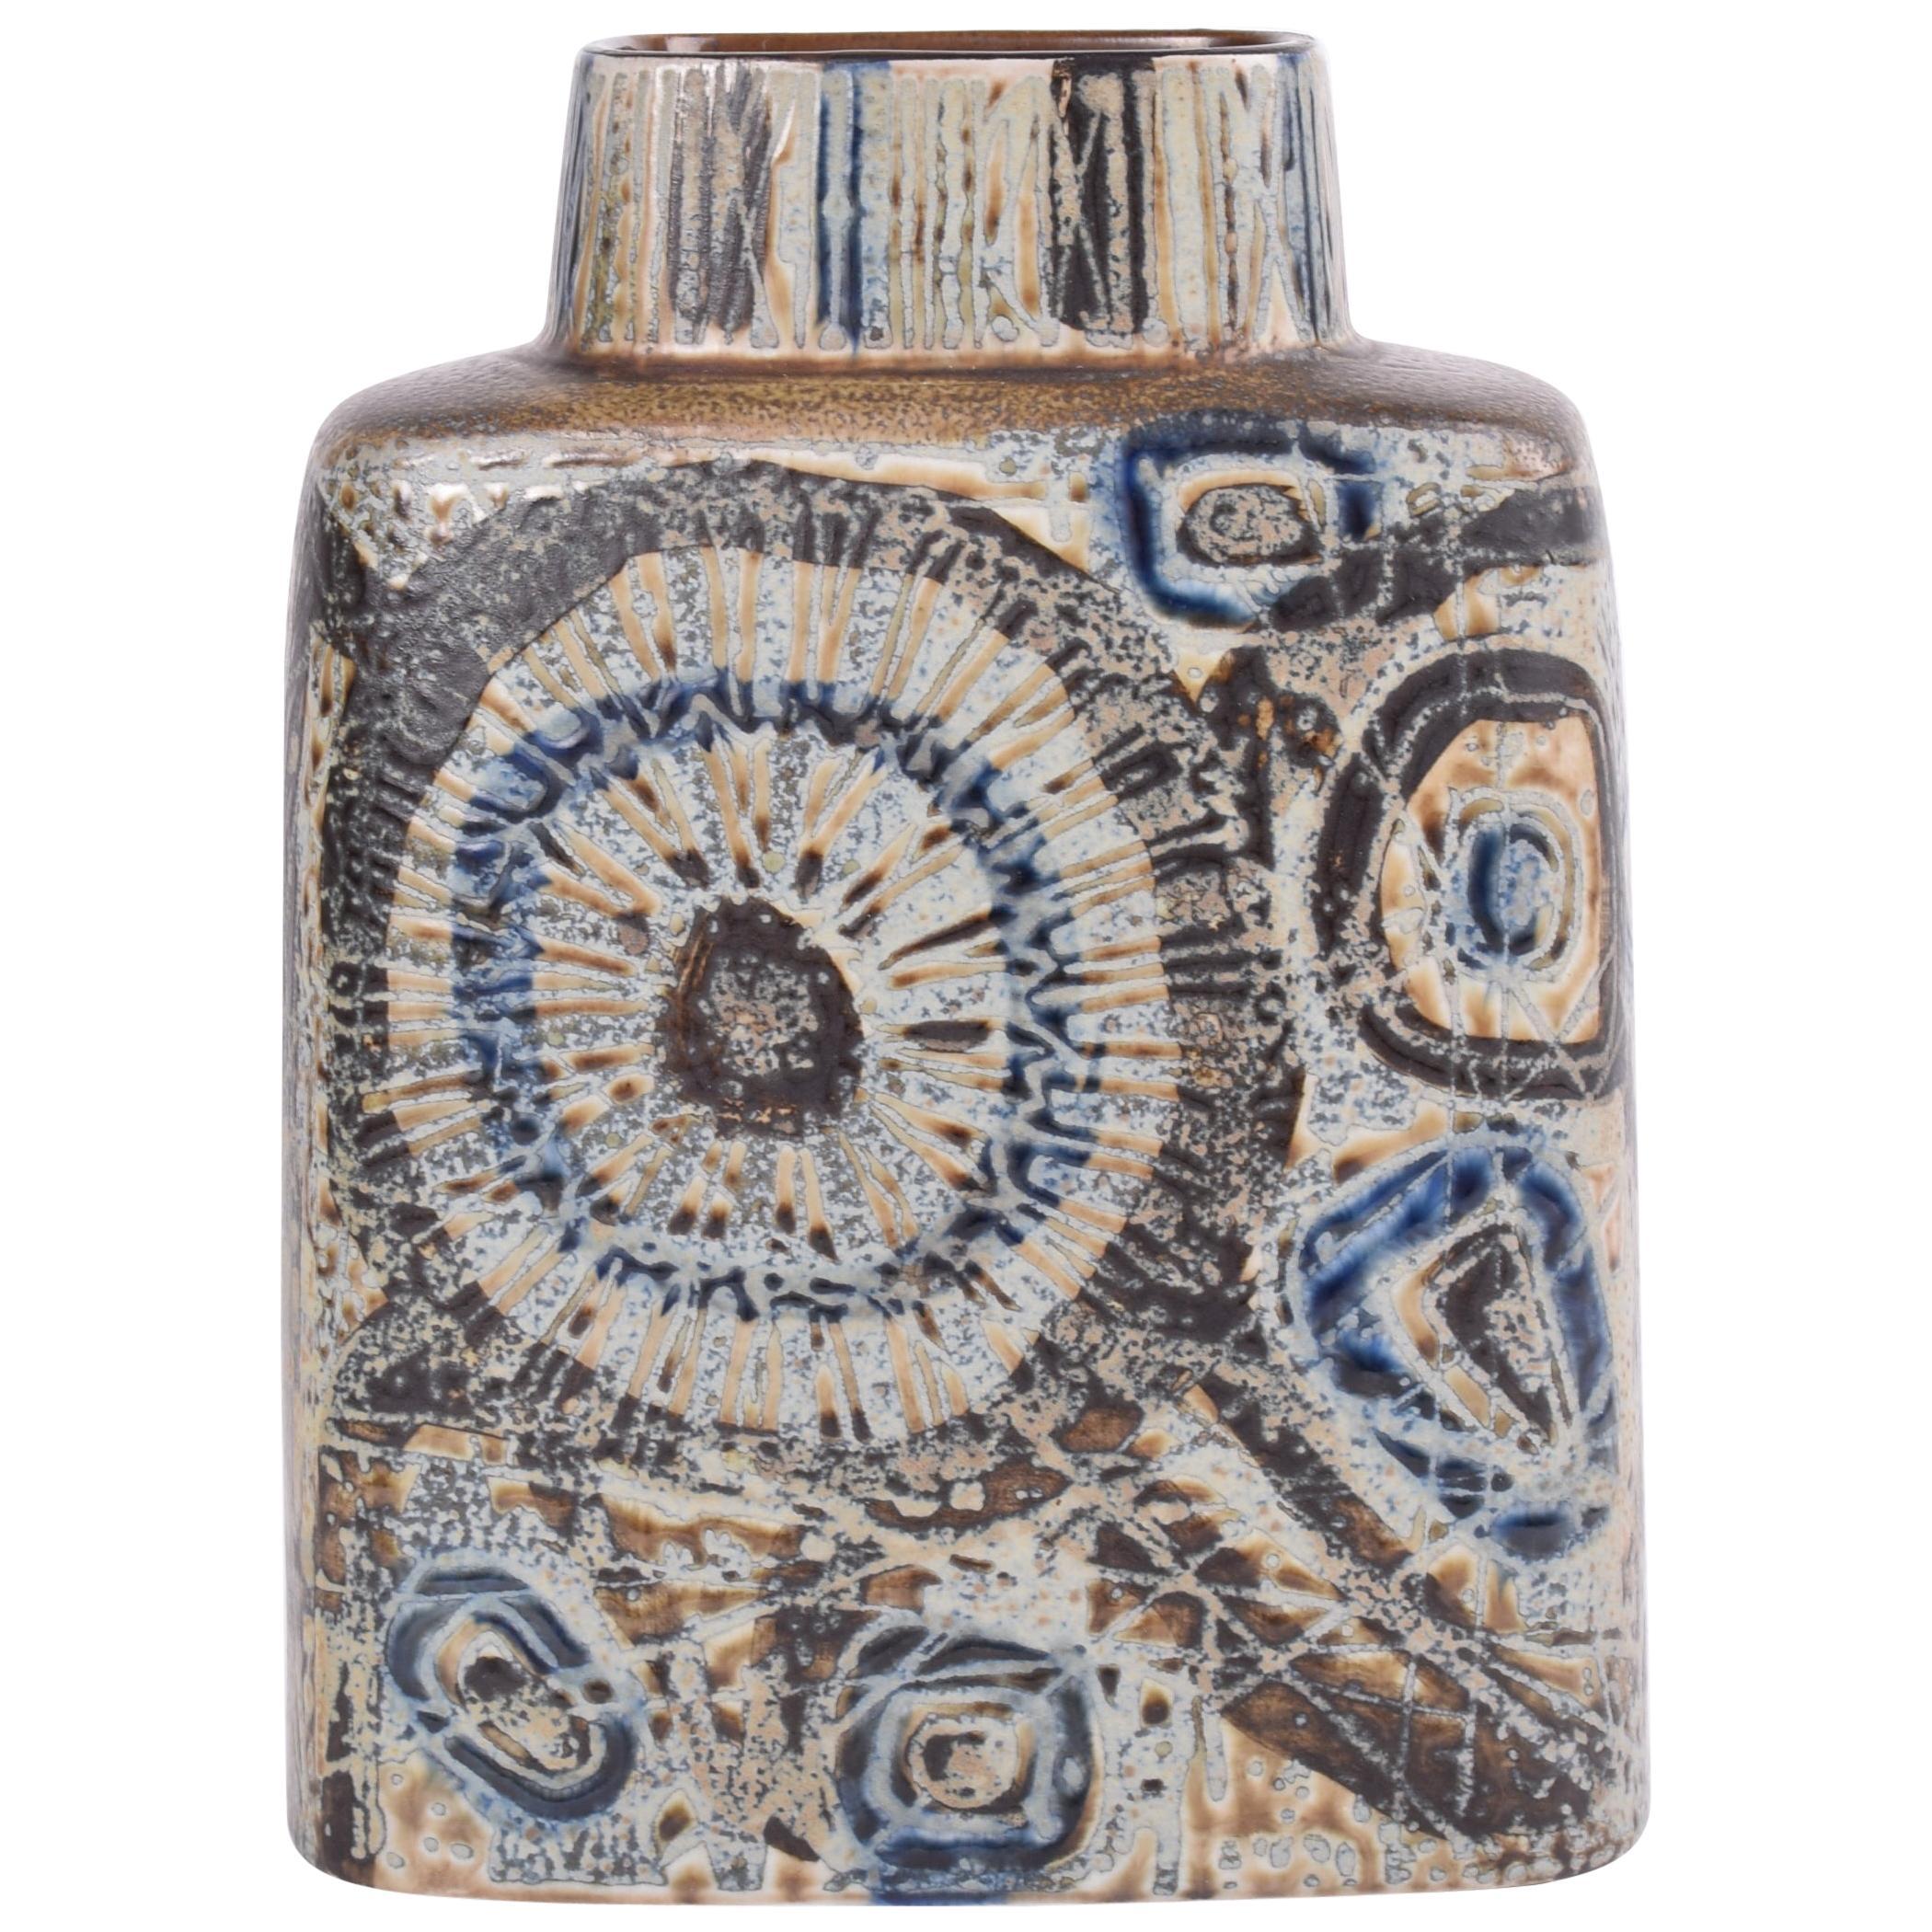 Nils Thorsson for Royal Copenhagen Baca Vase Brown Abstract Decor Danish Modern